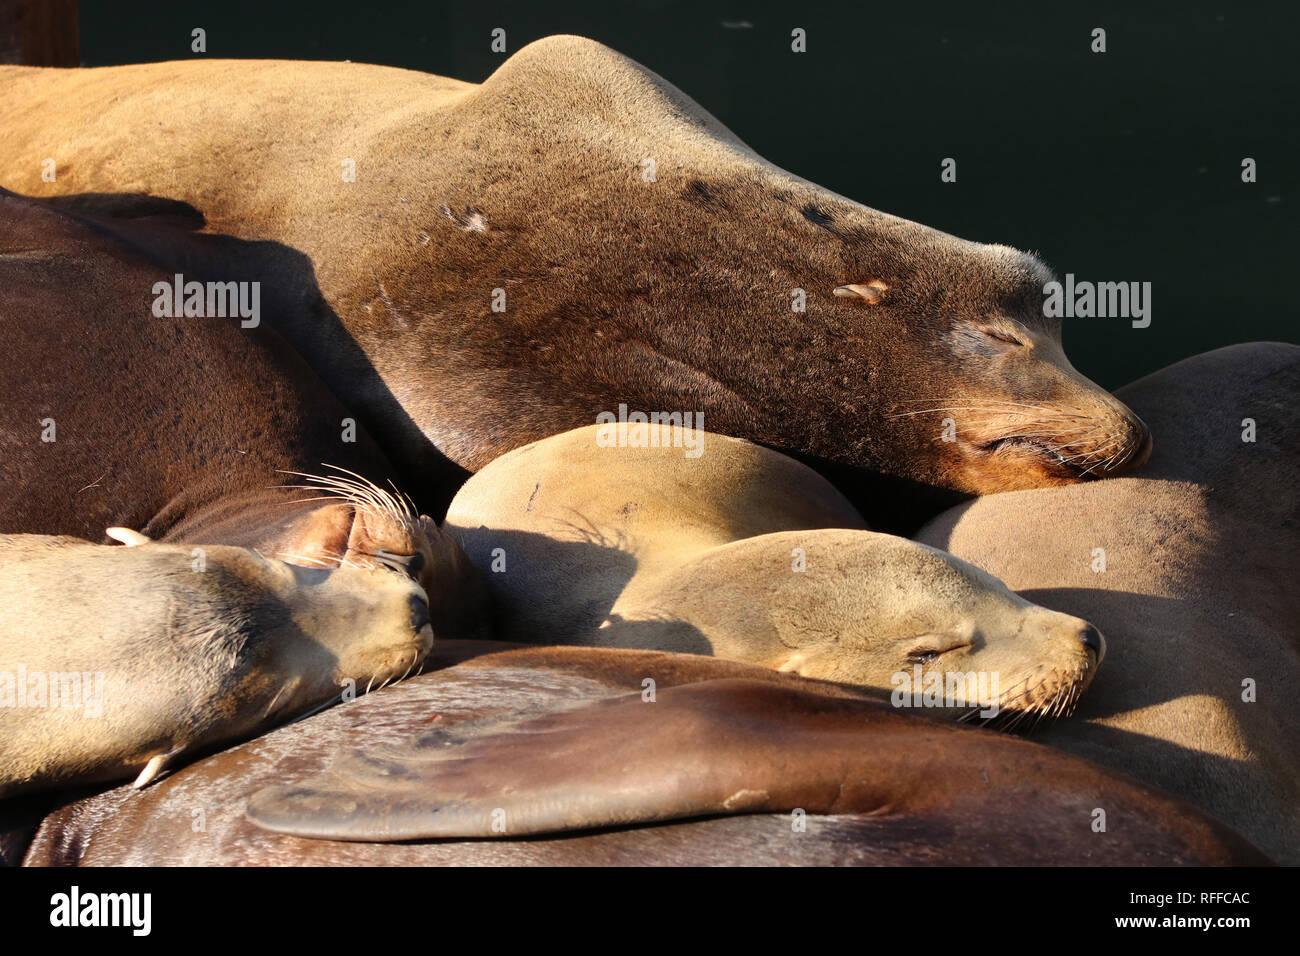 Kalifornischer Seelöwe, California Sea Lion, Zalophus californianus sleeping in Newport Oregon - Stock Image